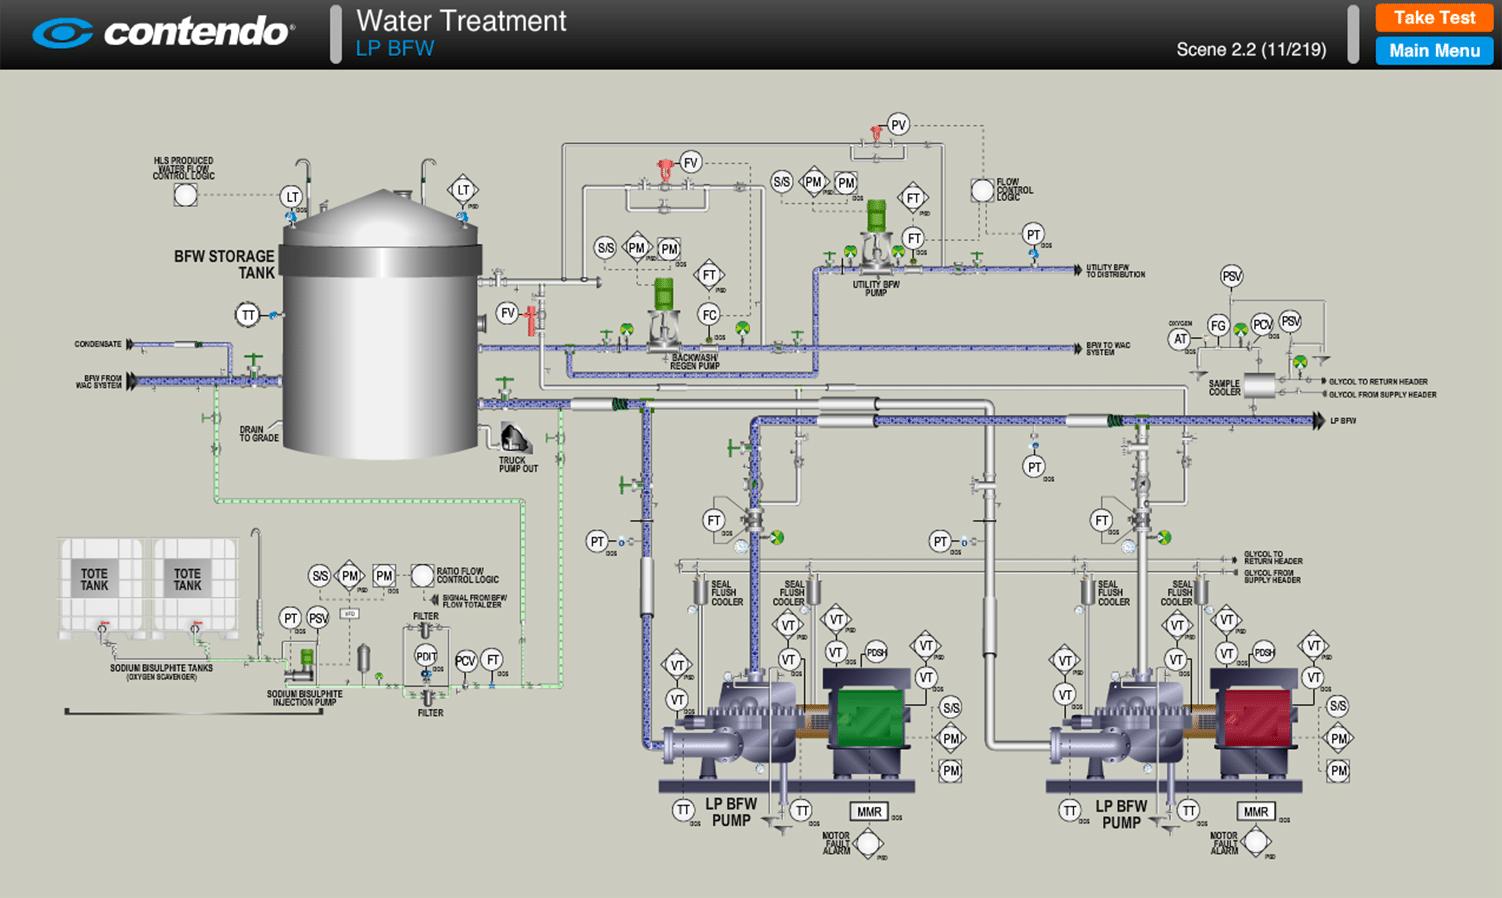 Boiler Feed Water Treatment ~ Low pressure boiler feed water bfw sagd oil sands